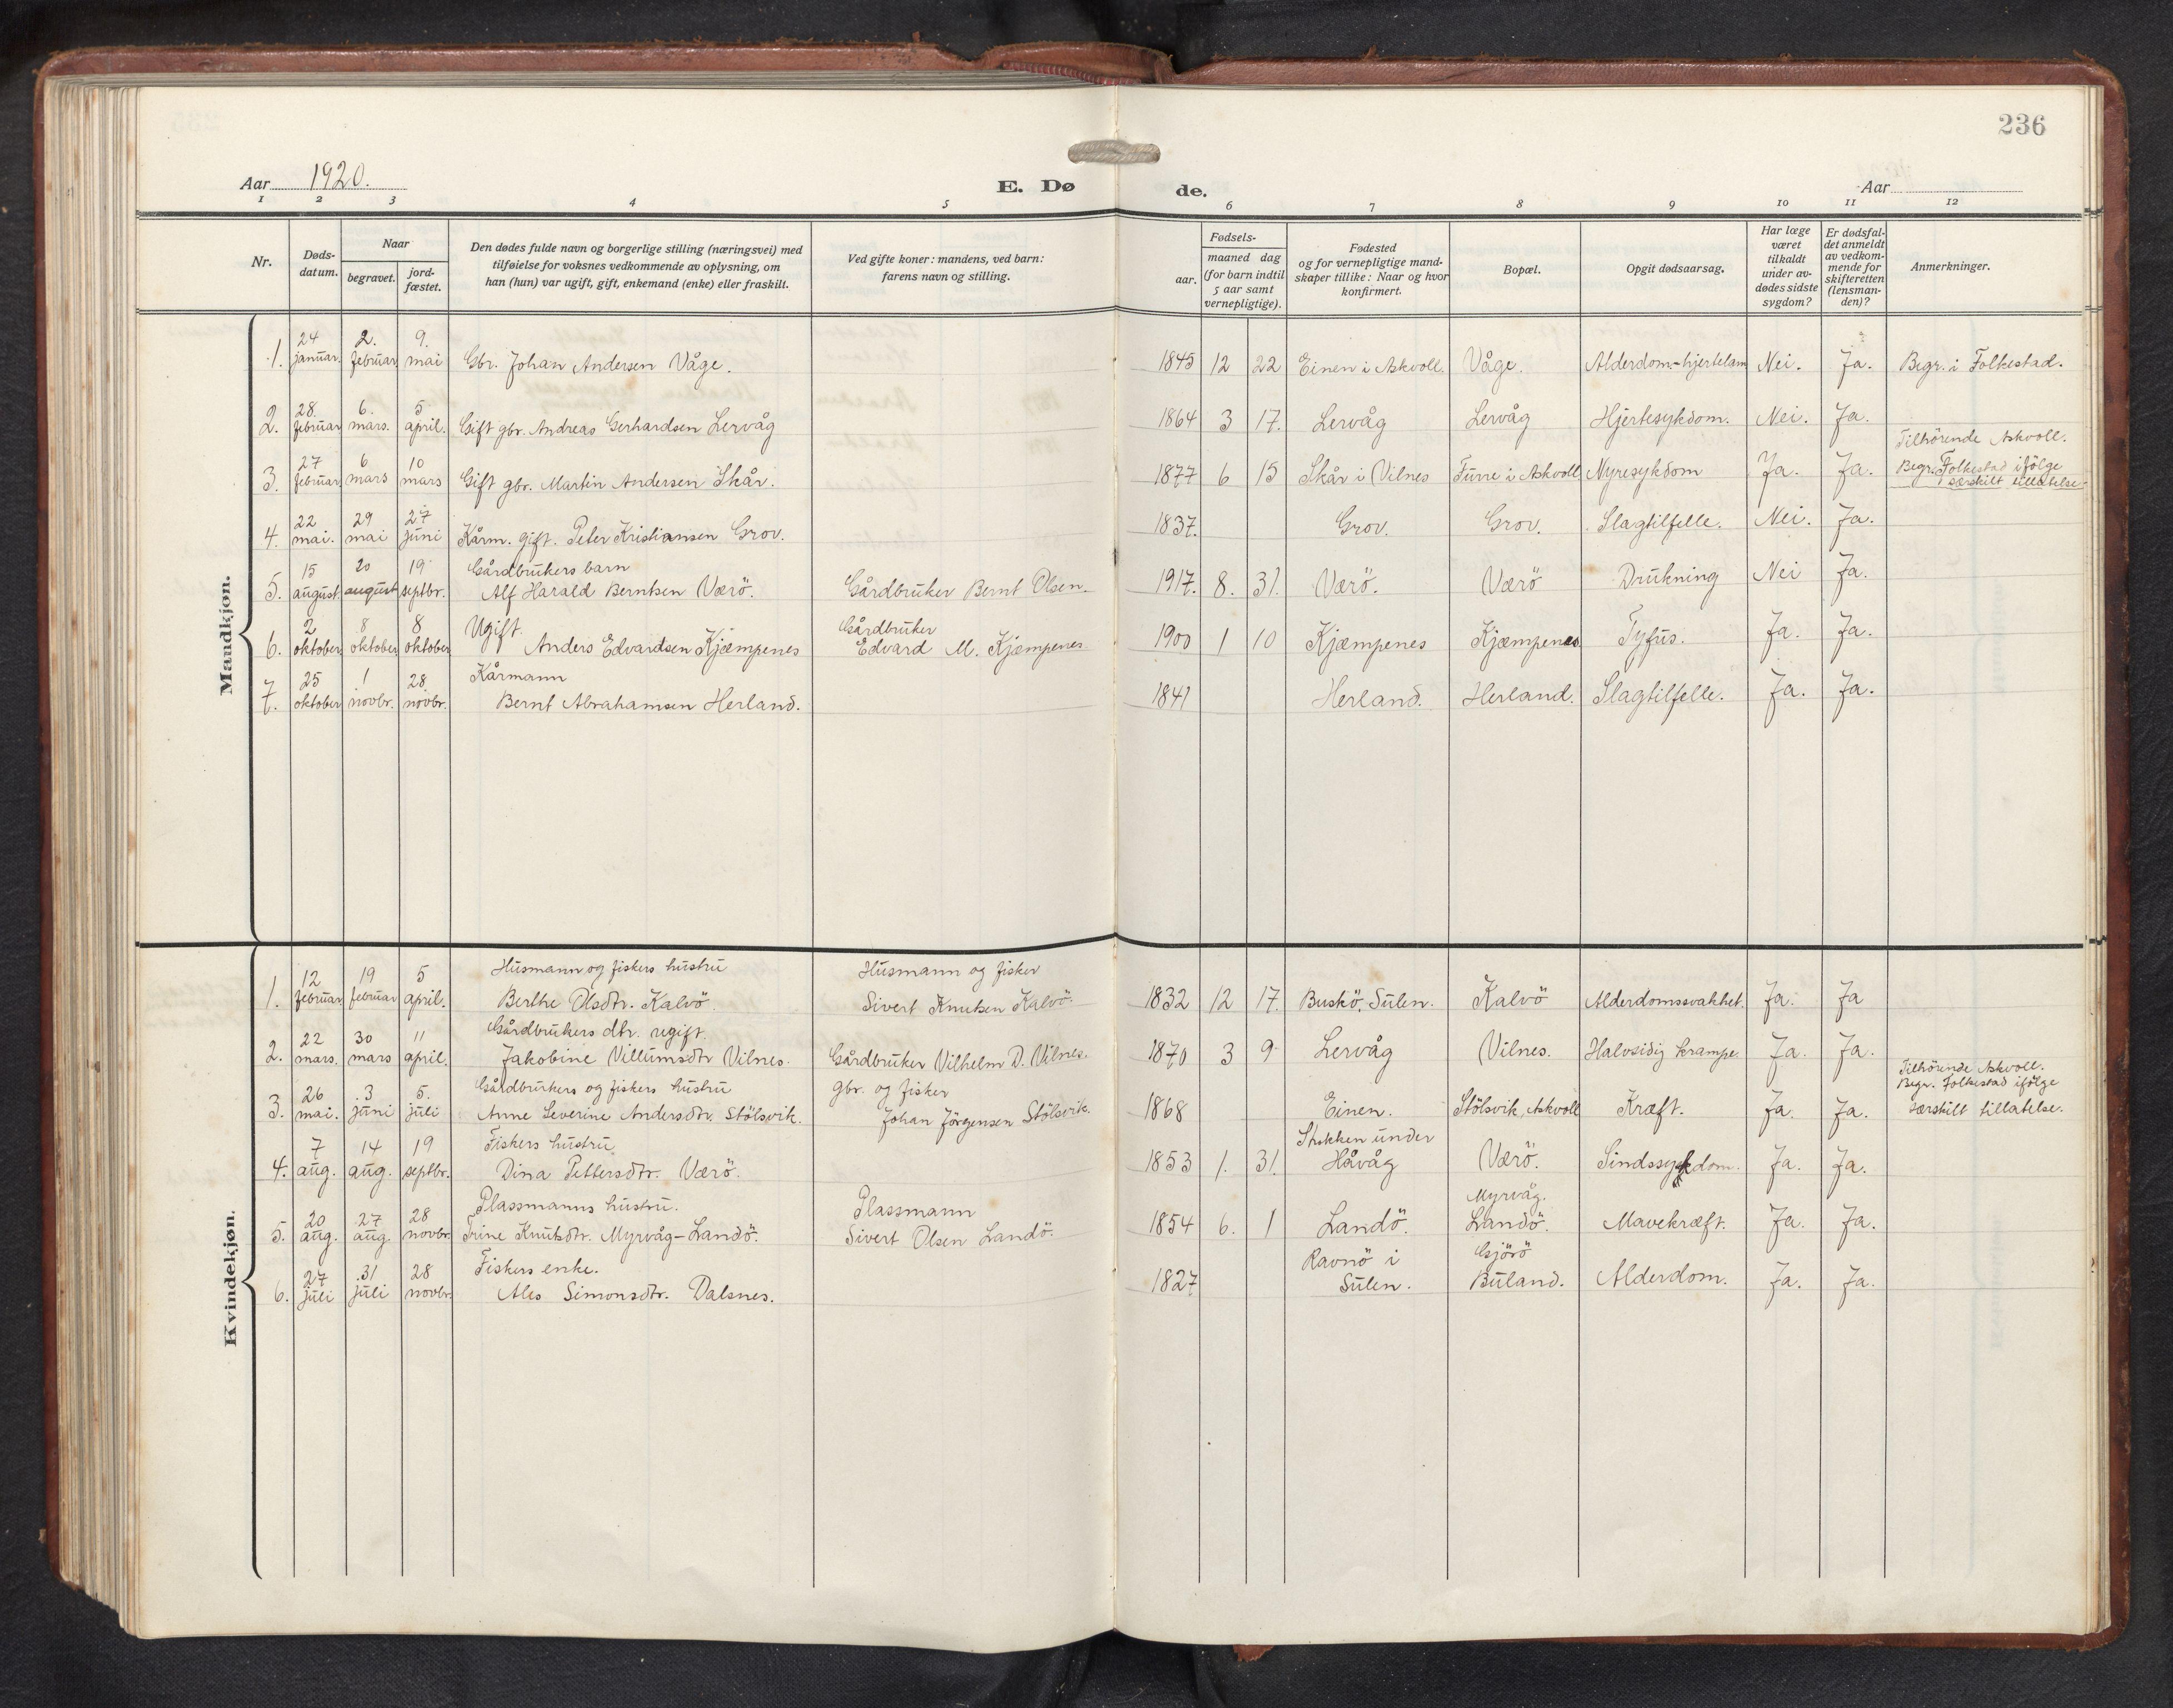 SAB, Askvoll sokneprestembete, H/Hab/Habb/L0002: Klokkerbok nr. B 2, 1910-1947, s. 235b-236a